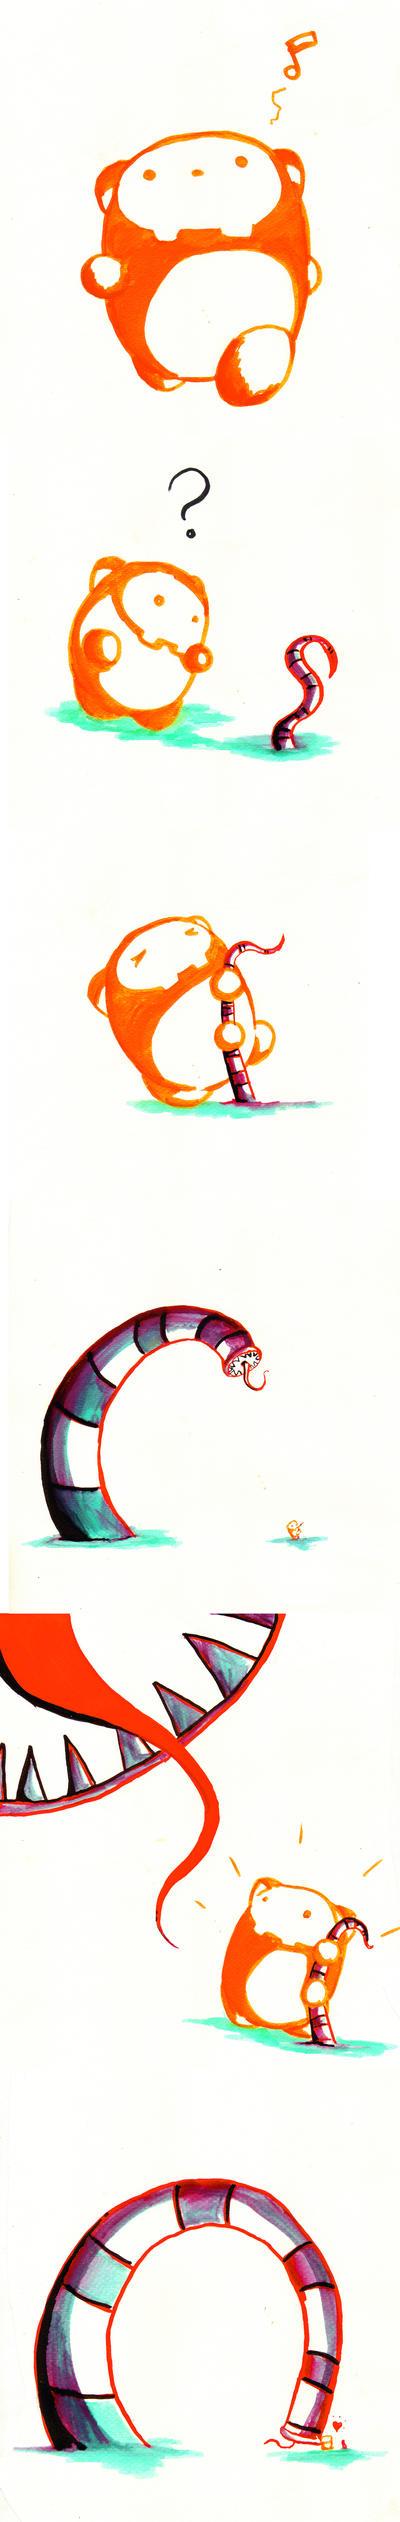 wormer by orangehamster